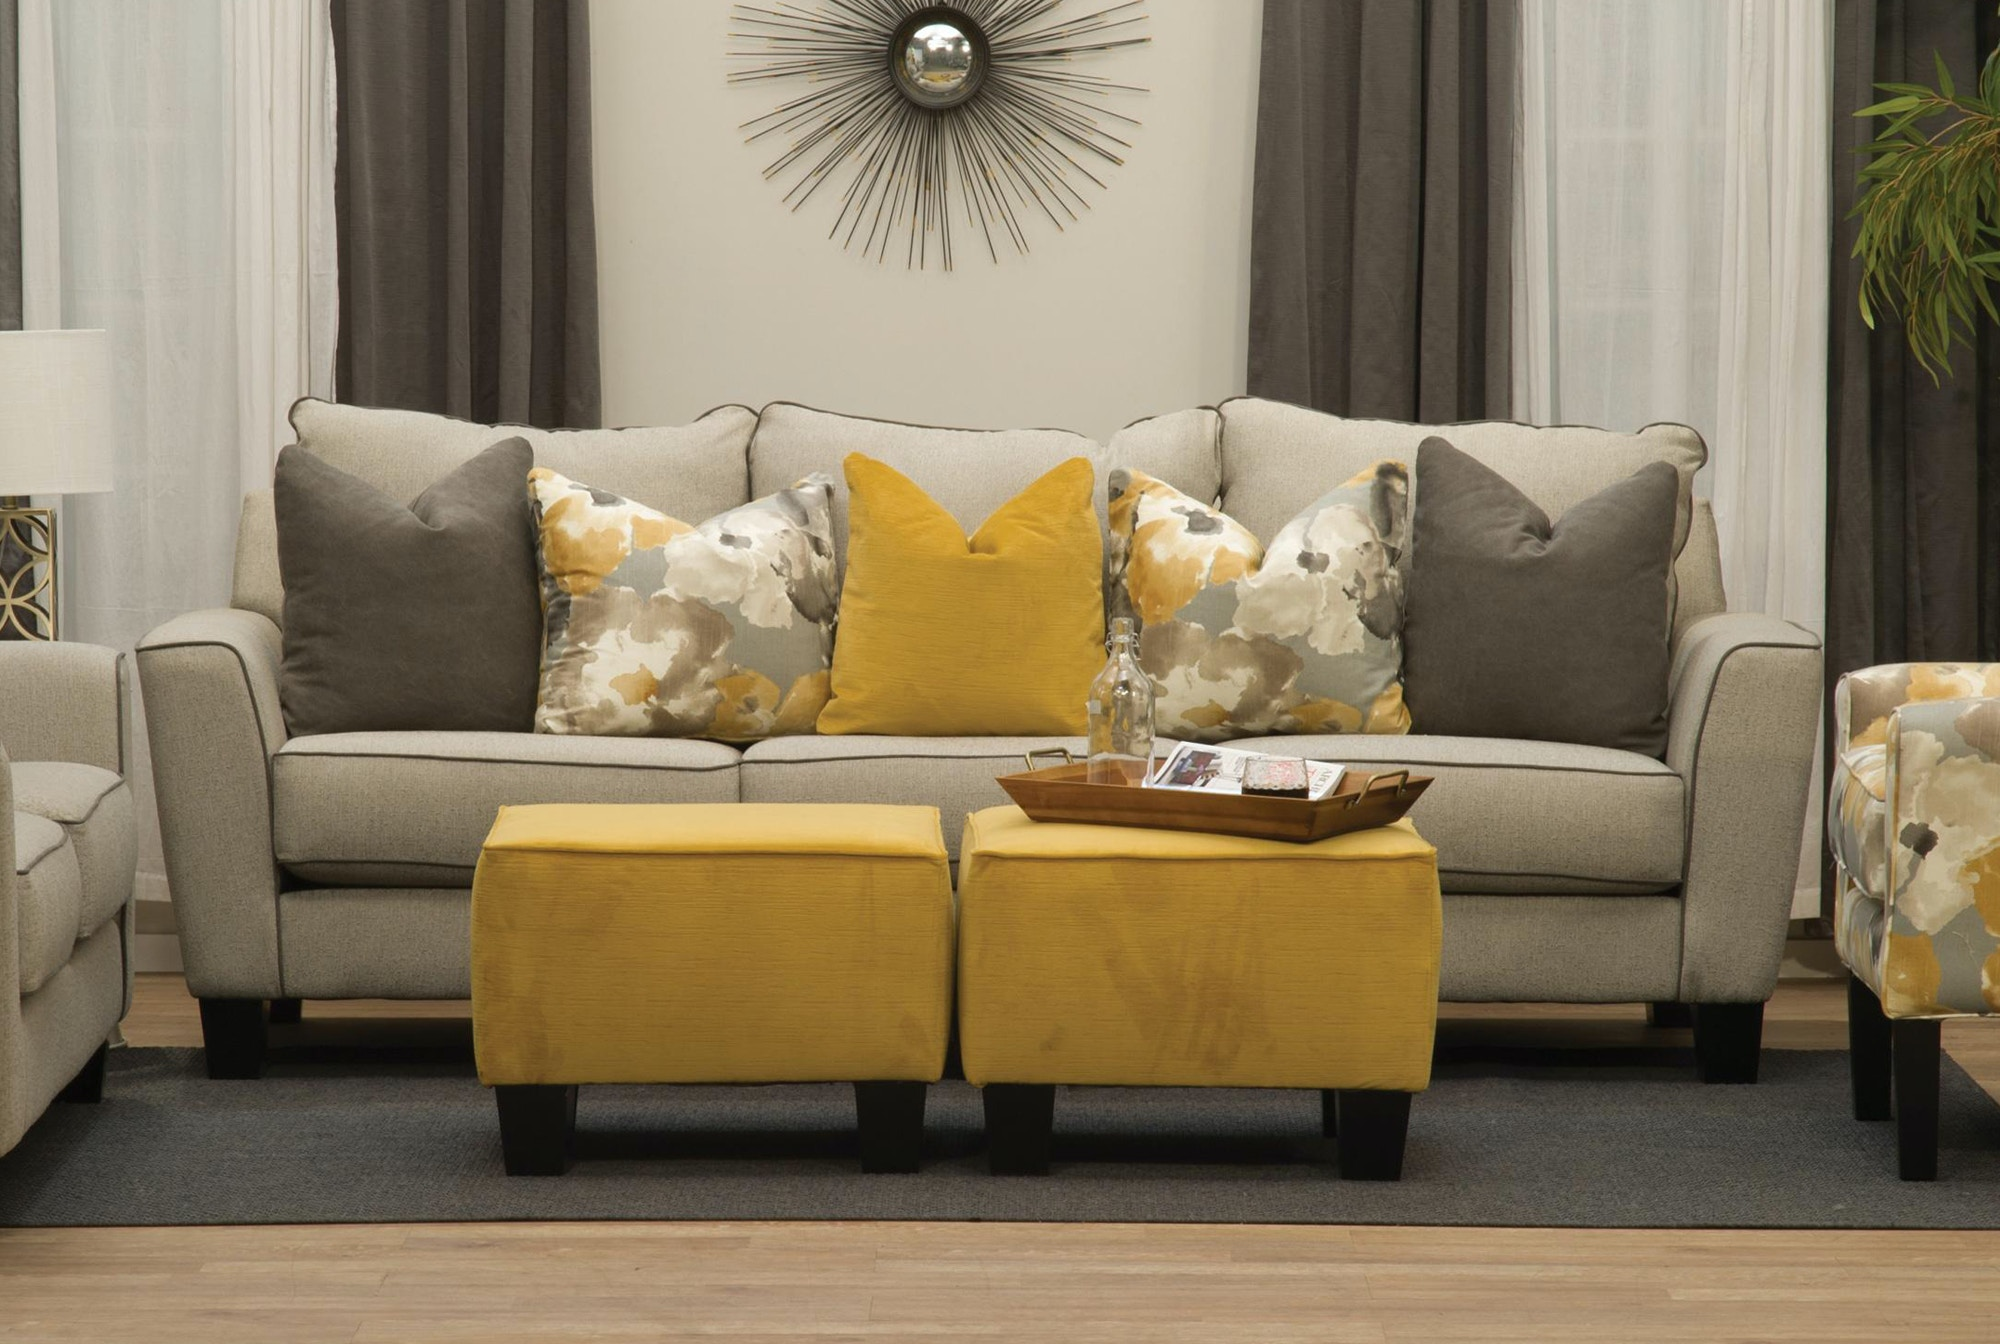 Lovely Squarefoot Michael Alexander Designs Sofa Girlsinoslo Pw